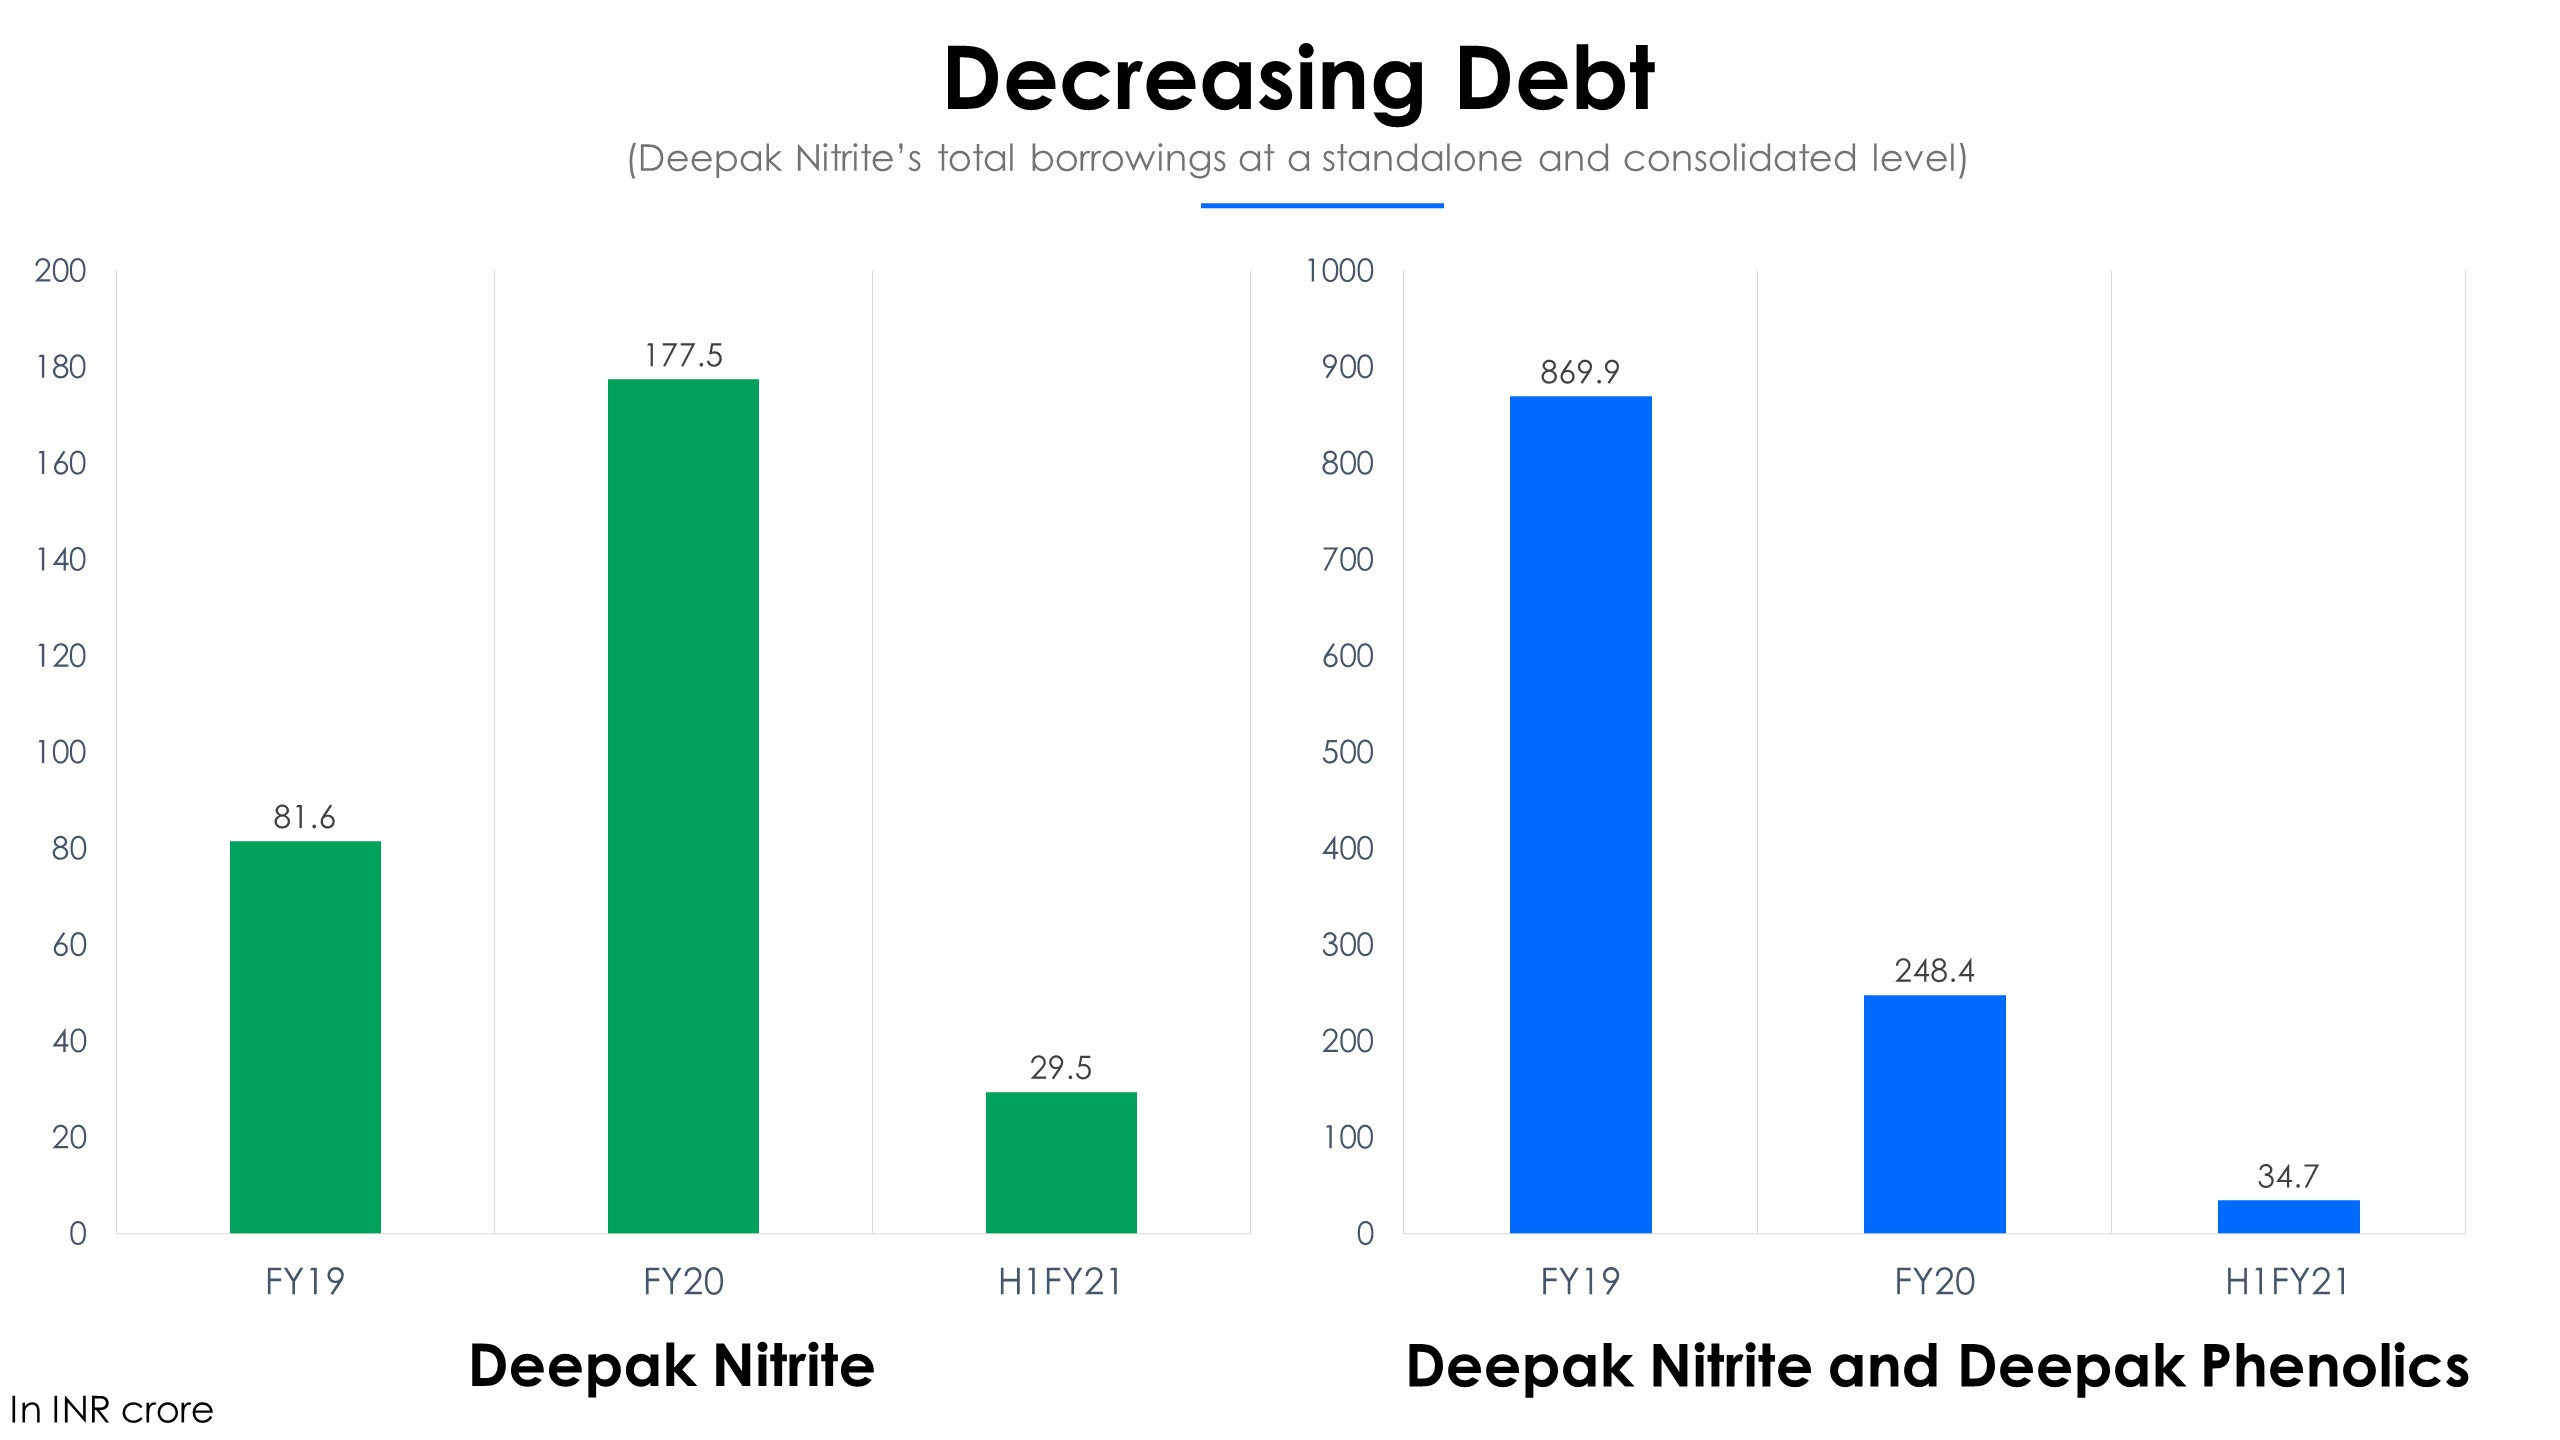 Deepak Nitrite Debt